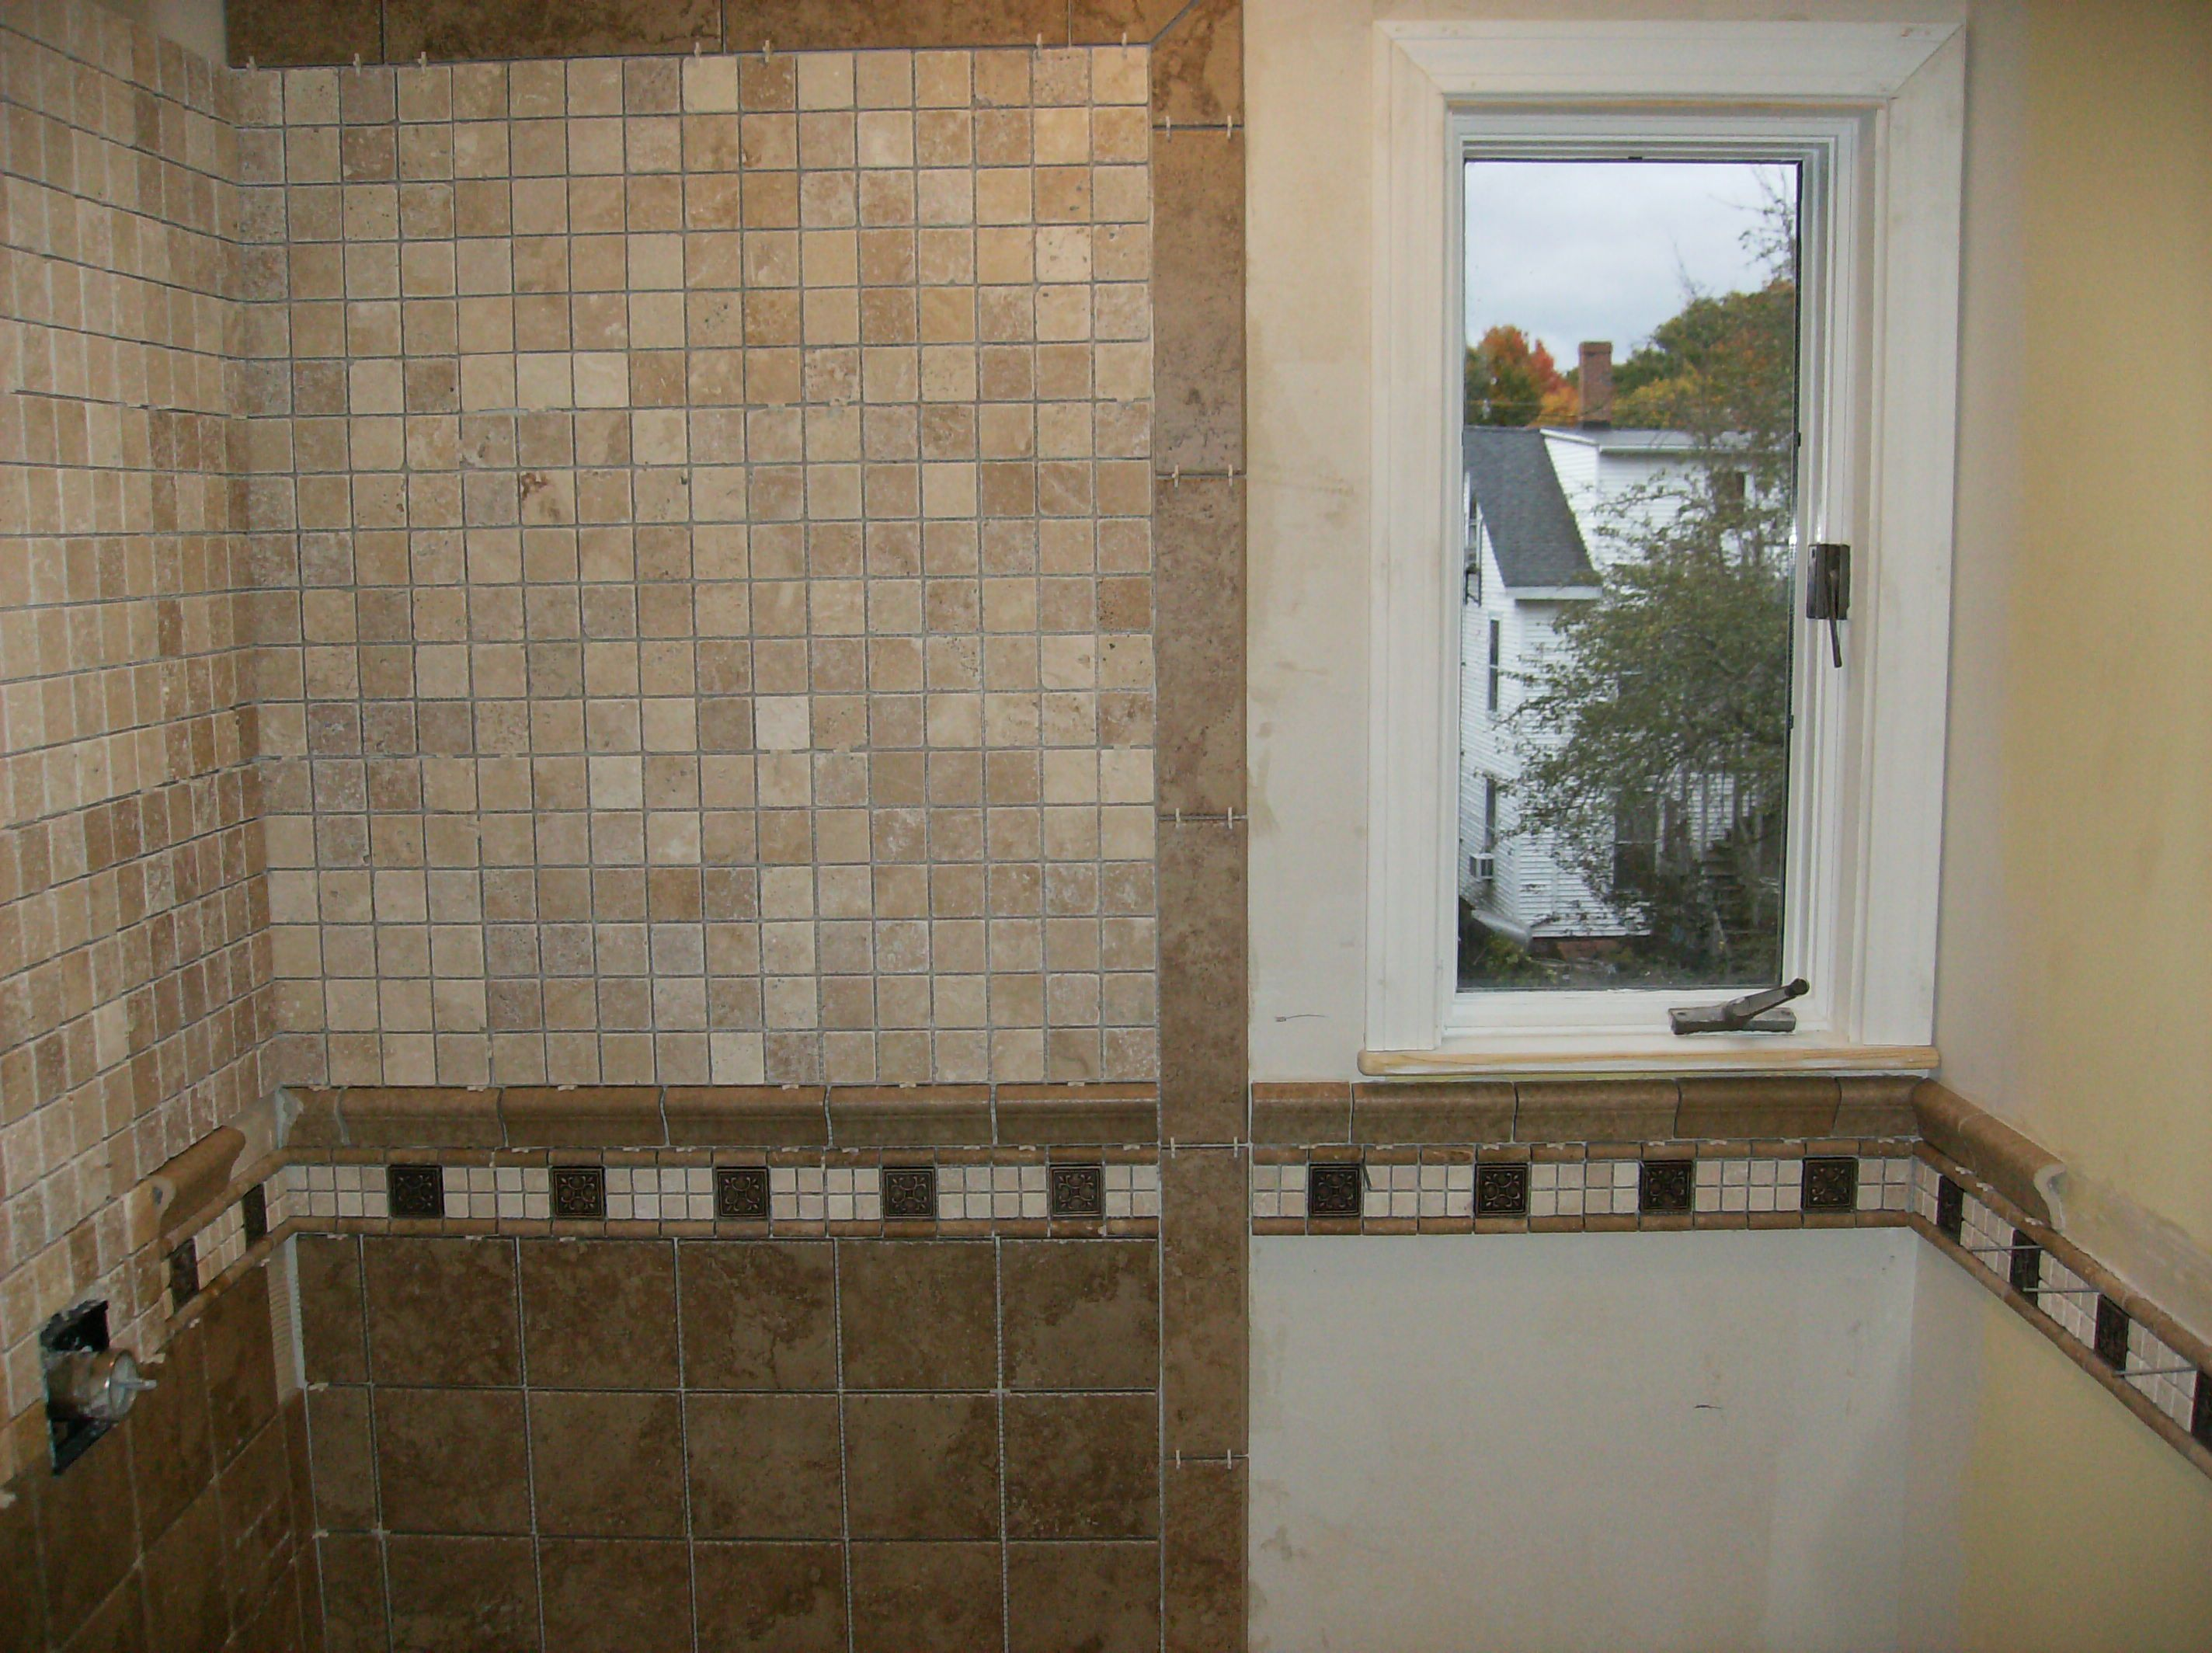 Chair Rail Tile In Shower Part - 33: Bathroom Tile: Chair Rail, Below U0026 Above Rail | Bathroom Tiling, Bathroom  Designs And Tile Flooring